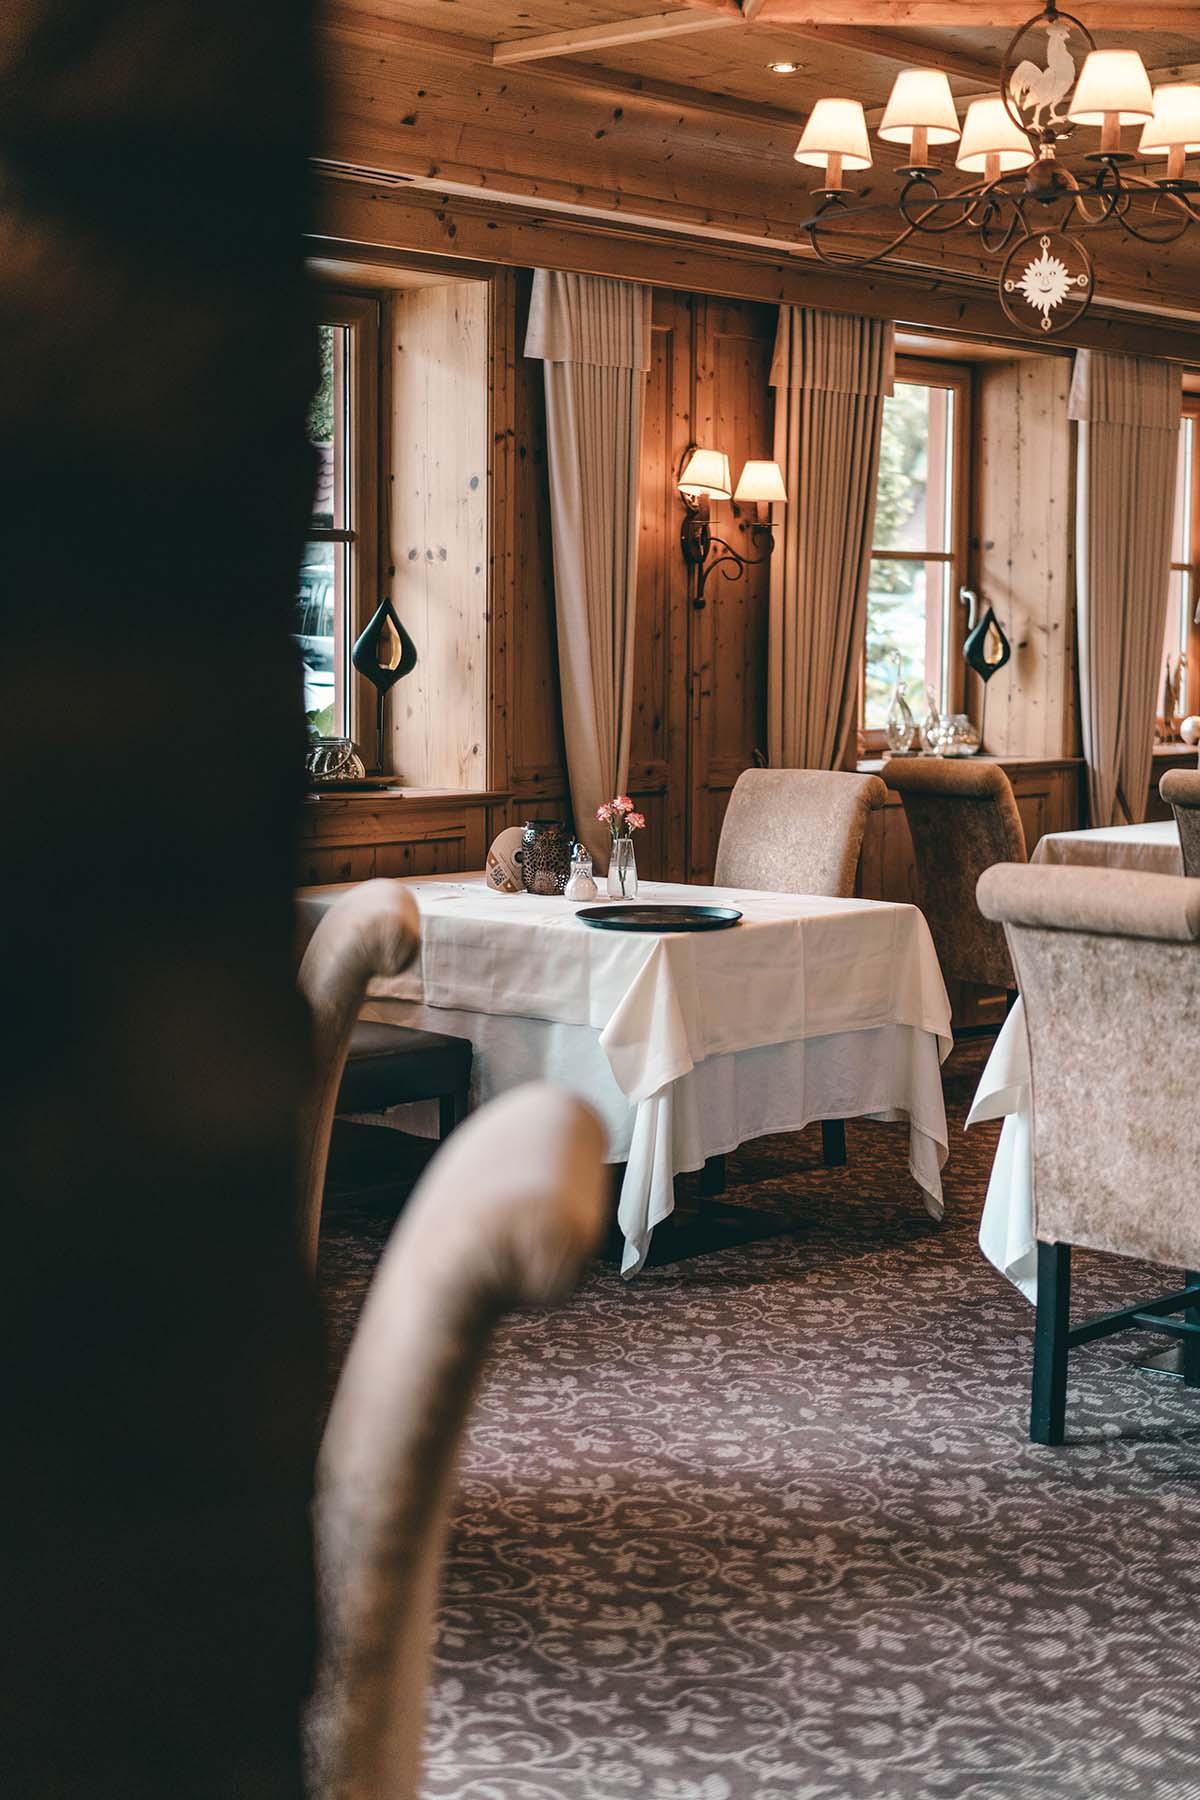 wellnesshotel-bayerwaldhof-restaurant-detail